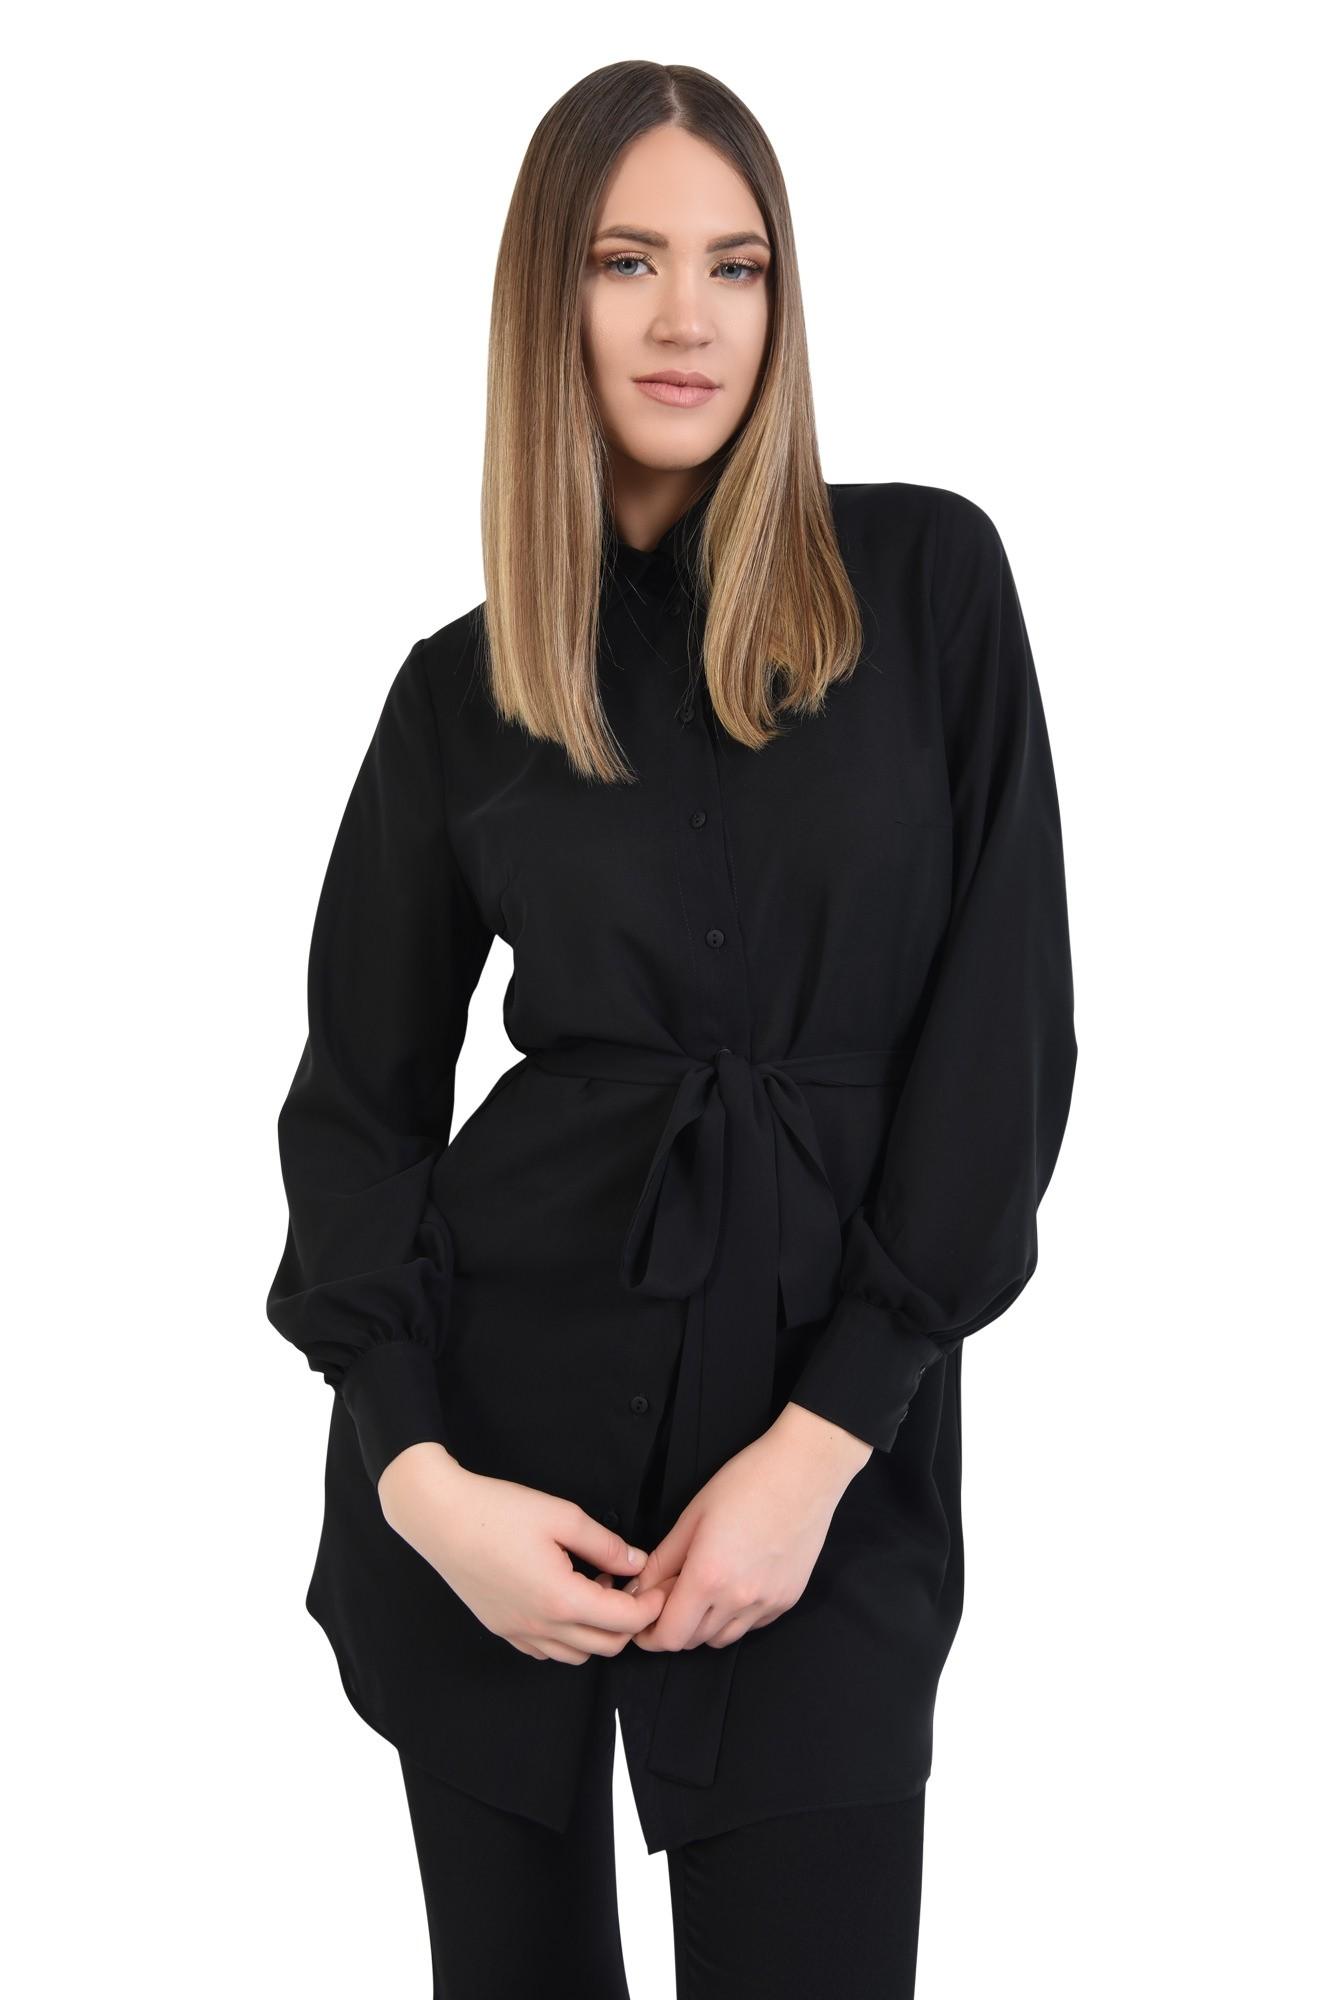 0 - camasa lunga, neagra, cu cordon, funda la talie, tunica